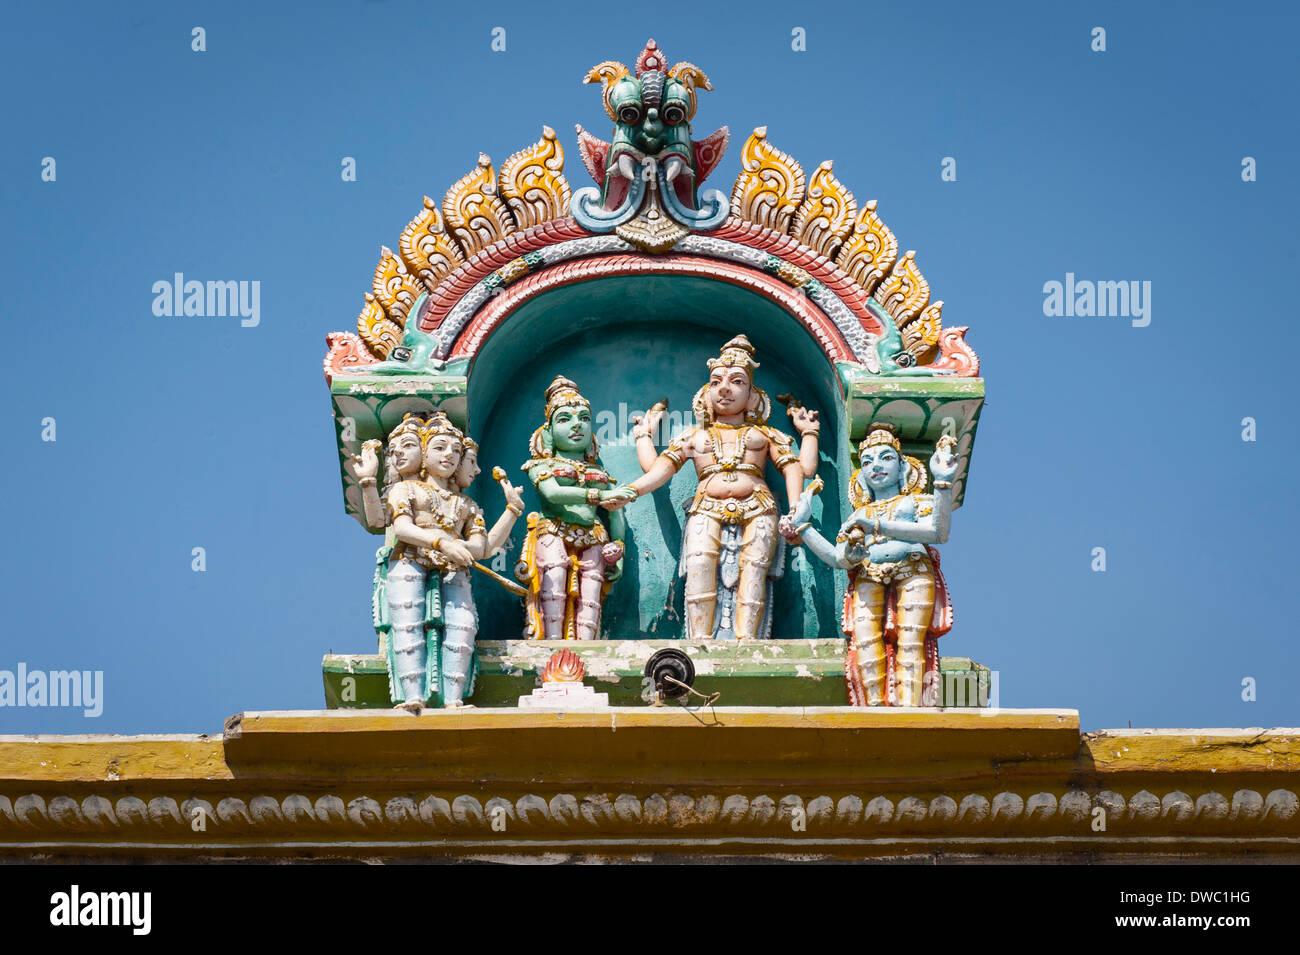 India Tamil Nadu Kanchipuram 6th century Sri Ekambareswarar Hindu Shiva Temple roof detail stucco figures statues sculptures colourful colorful - Stock Image